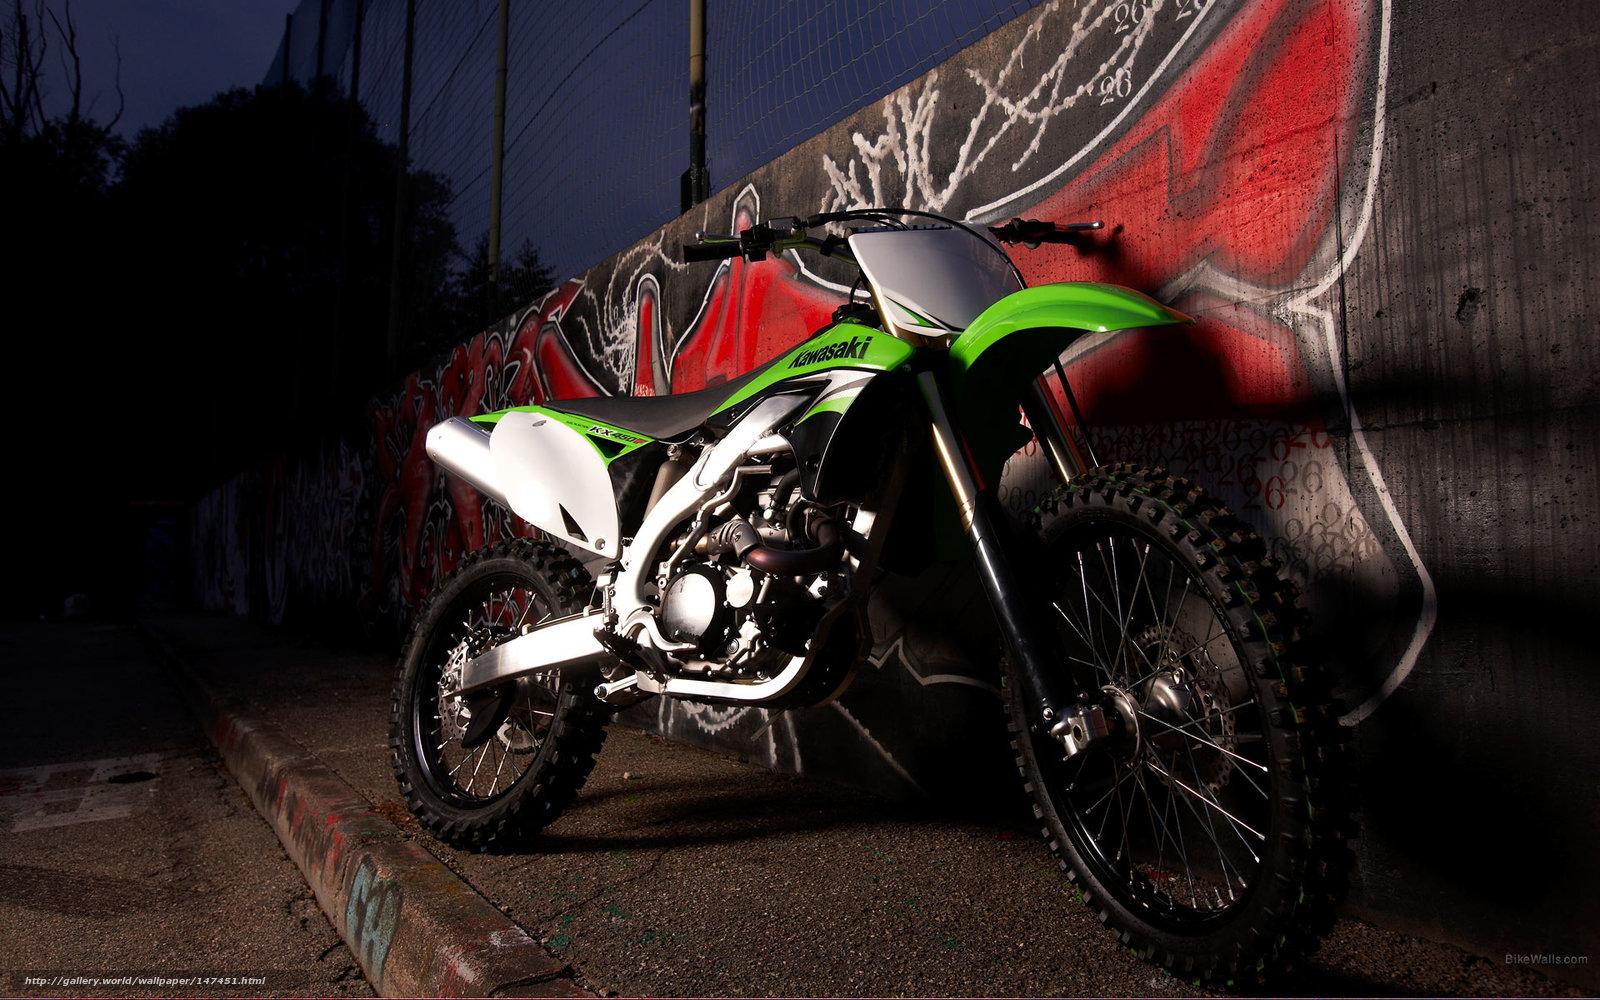 Motocross+Girl+Wallpapers Kawasaki Motocross Girls Image Search ...